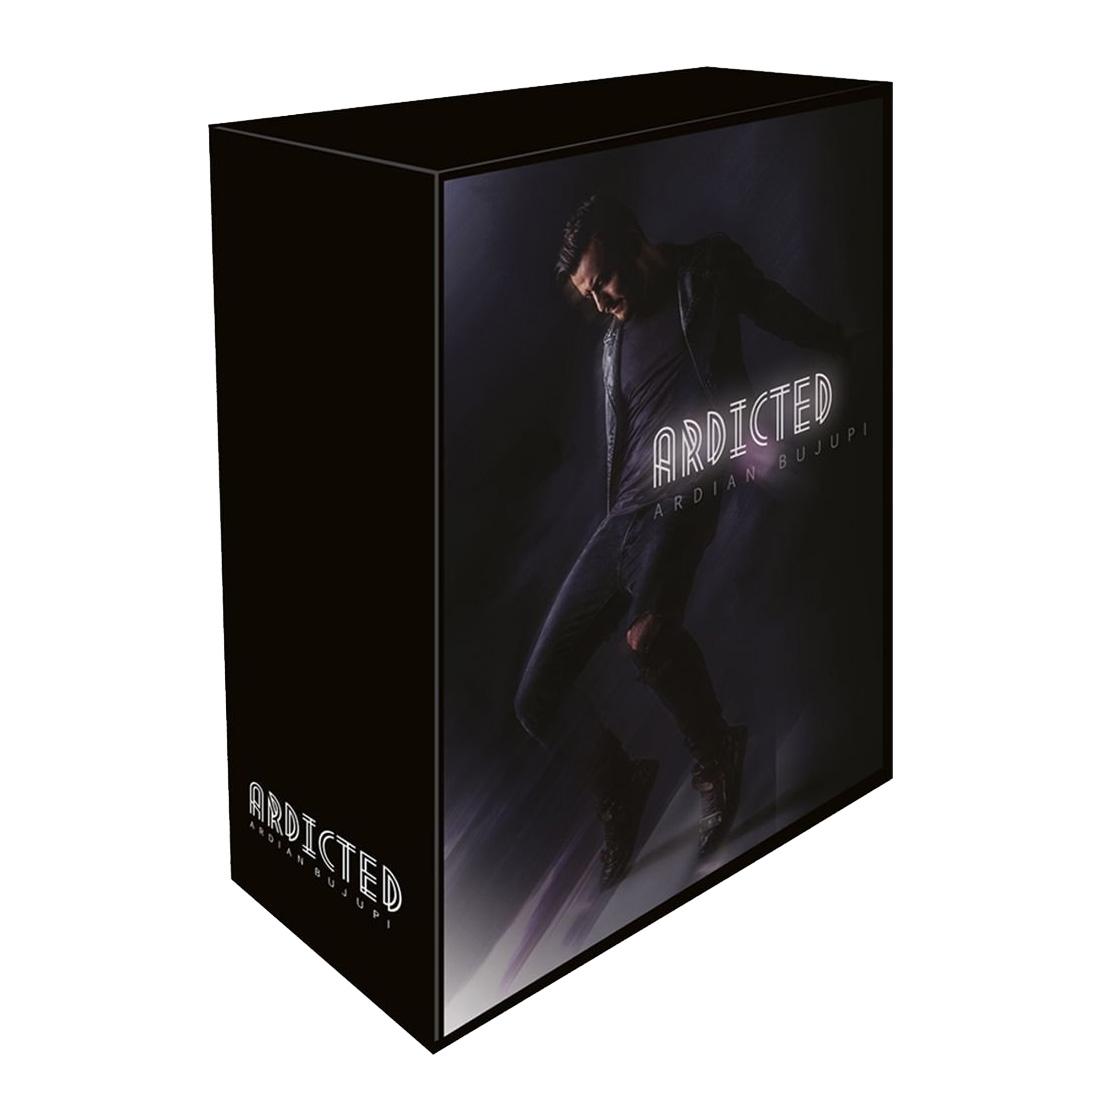 Ardicted (ltd. Fan Edition mit T-Shirt Boys M) von Ardian Bujupi - Boxset jetzt im Bravado Shop